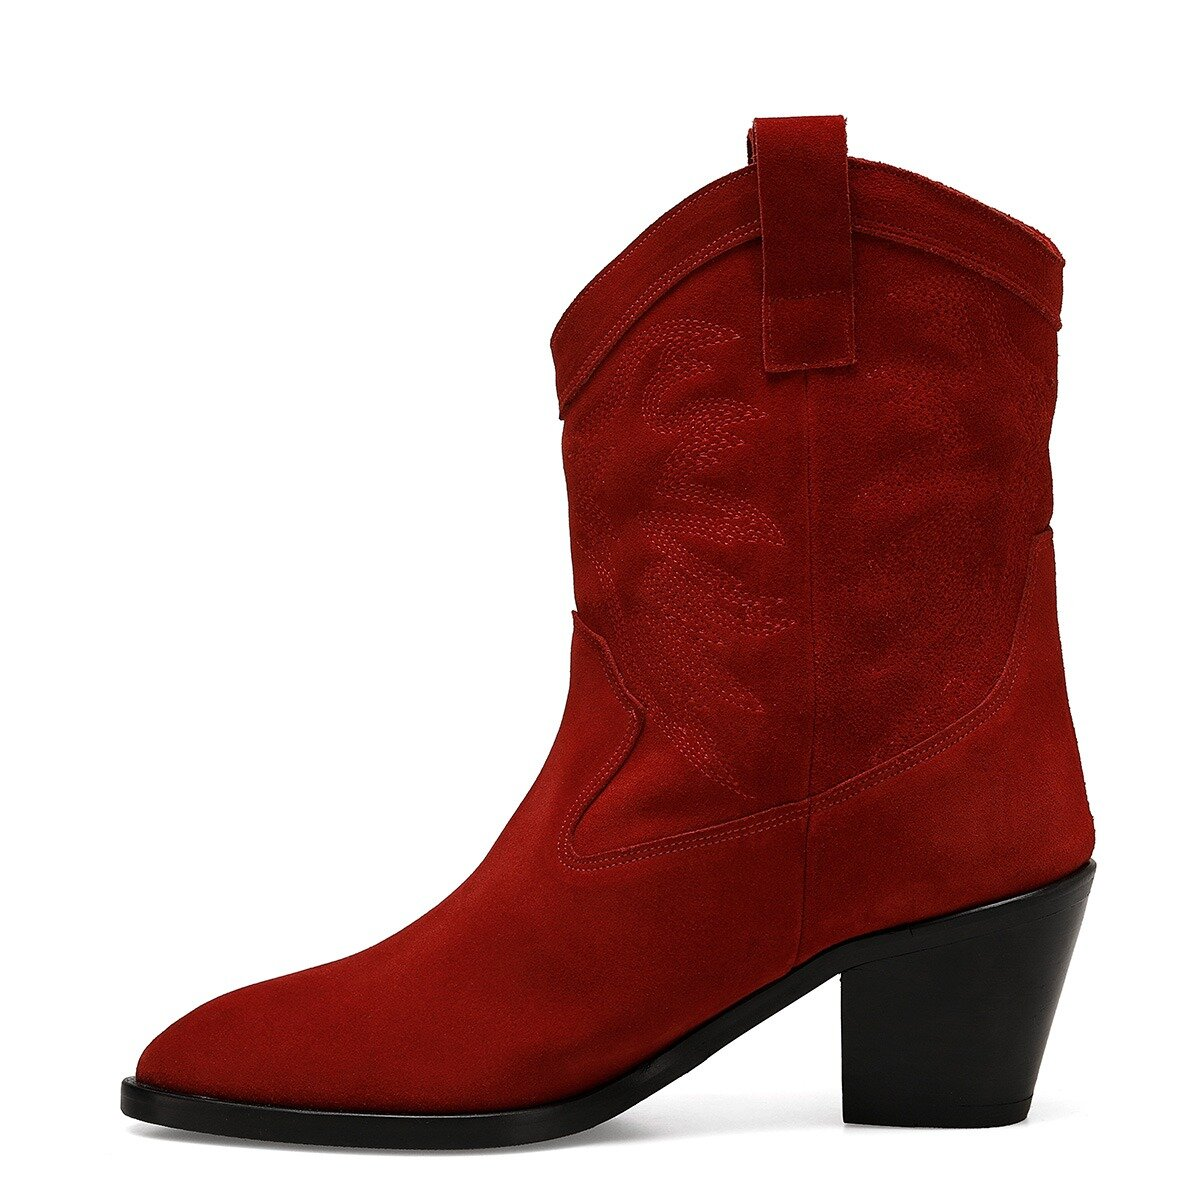 OLIVA Kırmızı Kadın Topuklu Bot